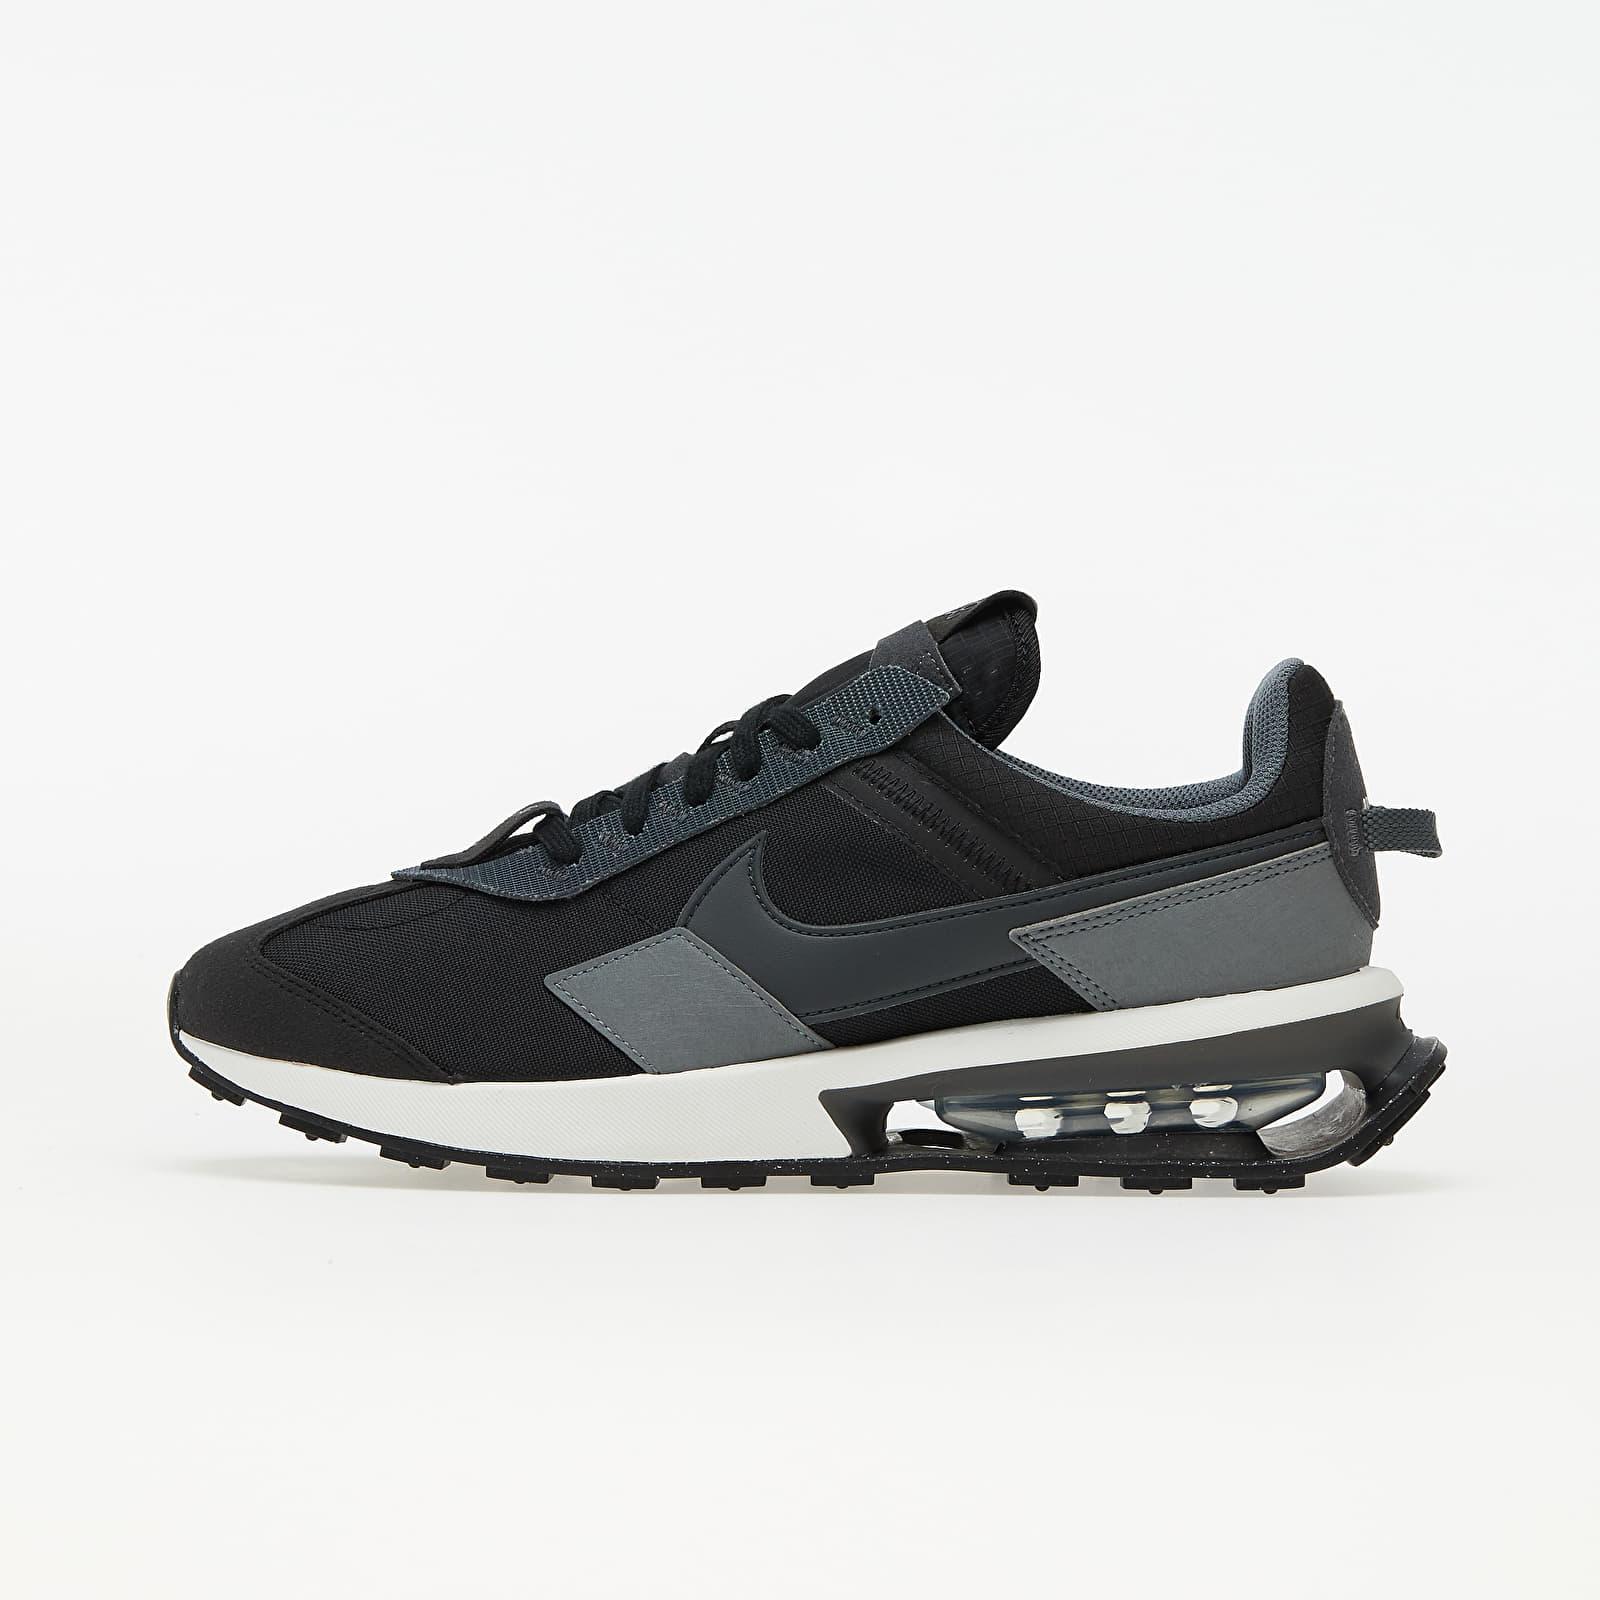 Nike Air Max Pre-Day Black/ Anthracite-Iron Grey-Smoke Grey EUR 41